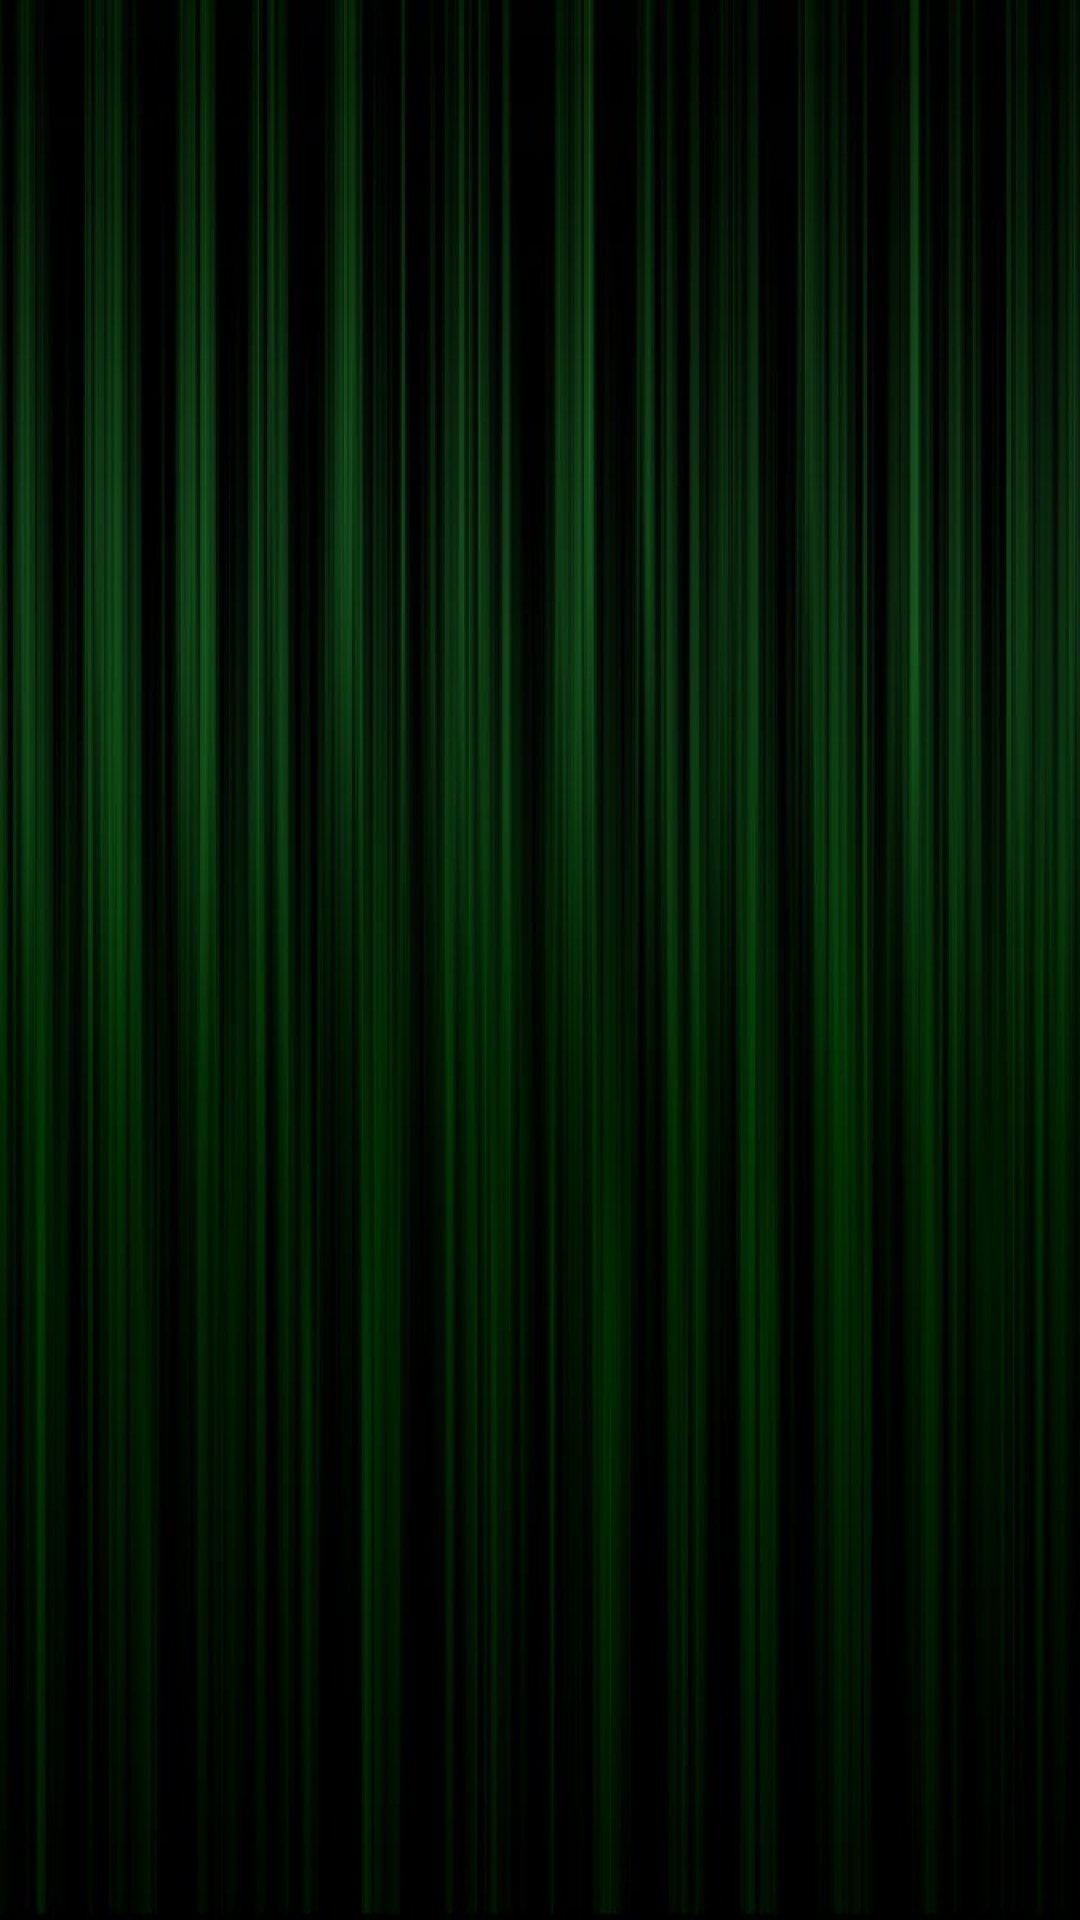 Download Wallpaper 1080x1920 green, bands, vertical, dark, shadow Sony ...